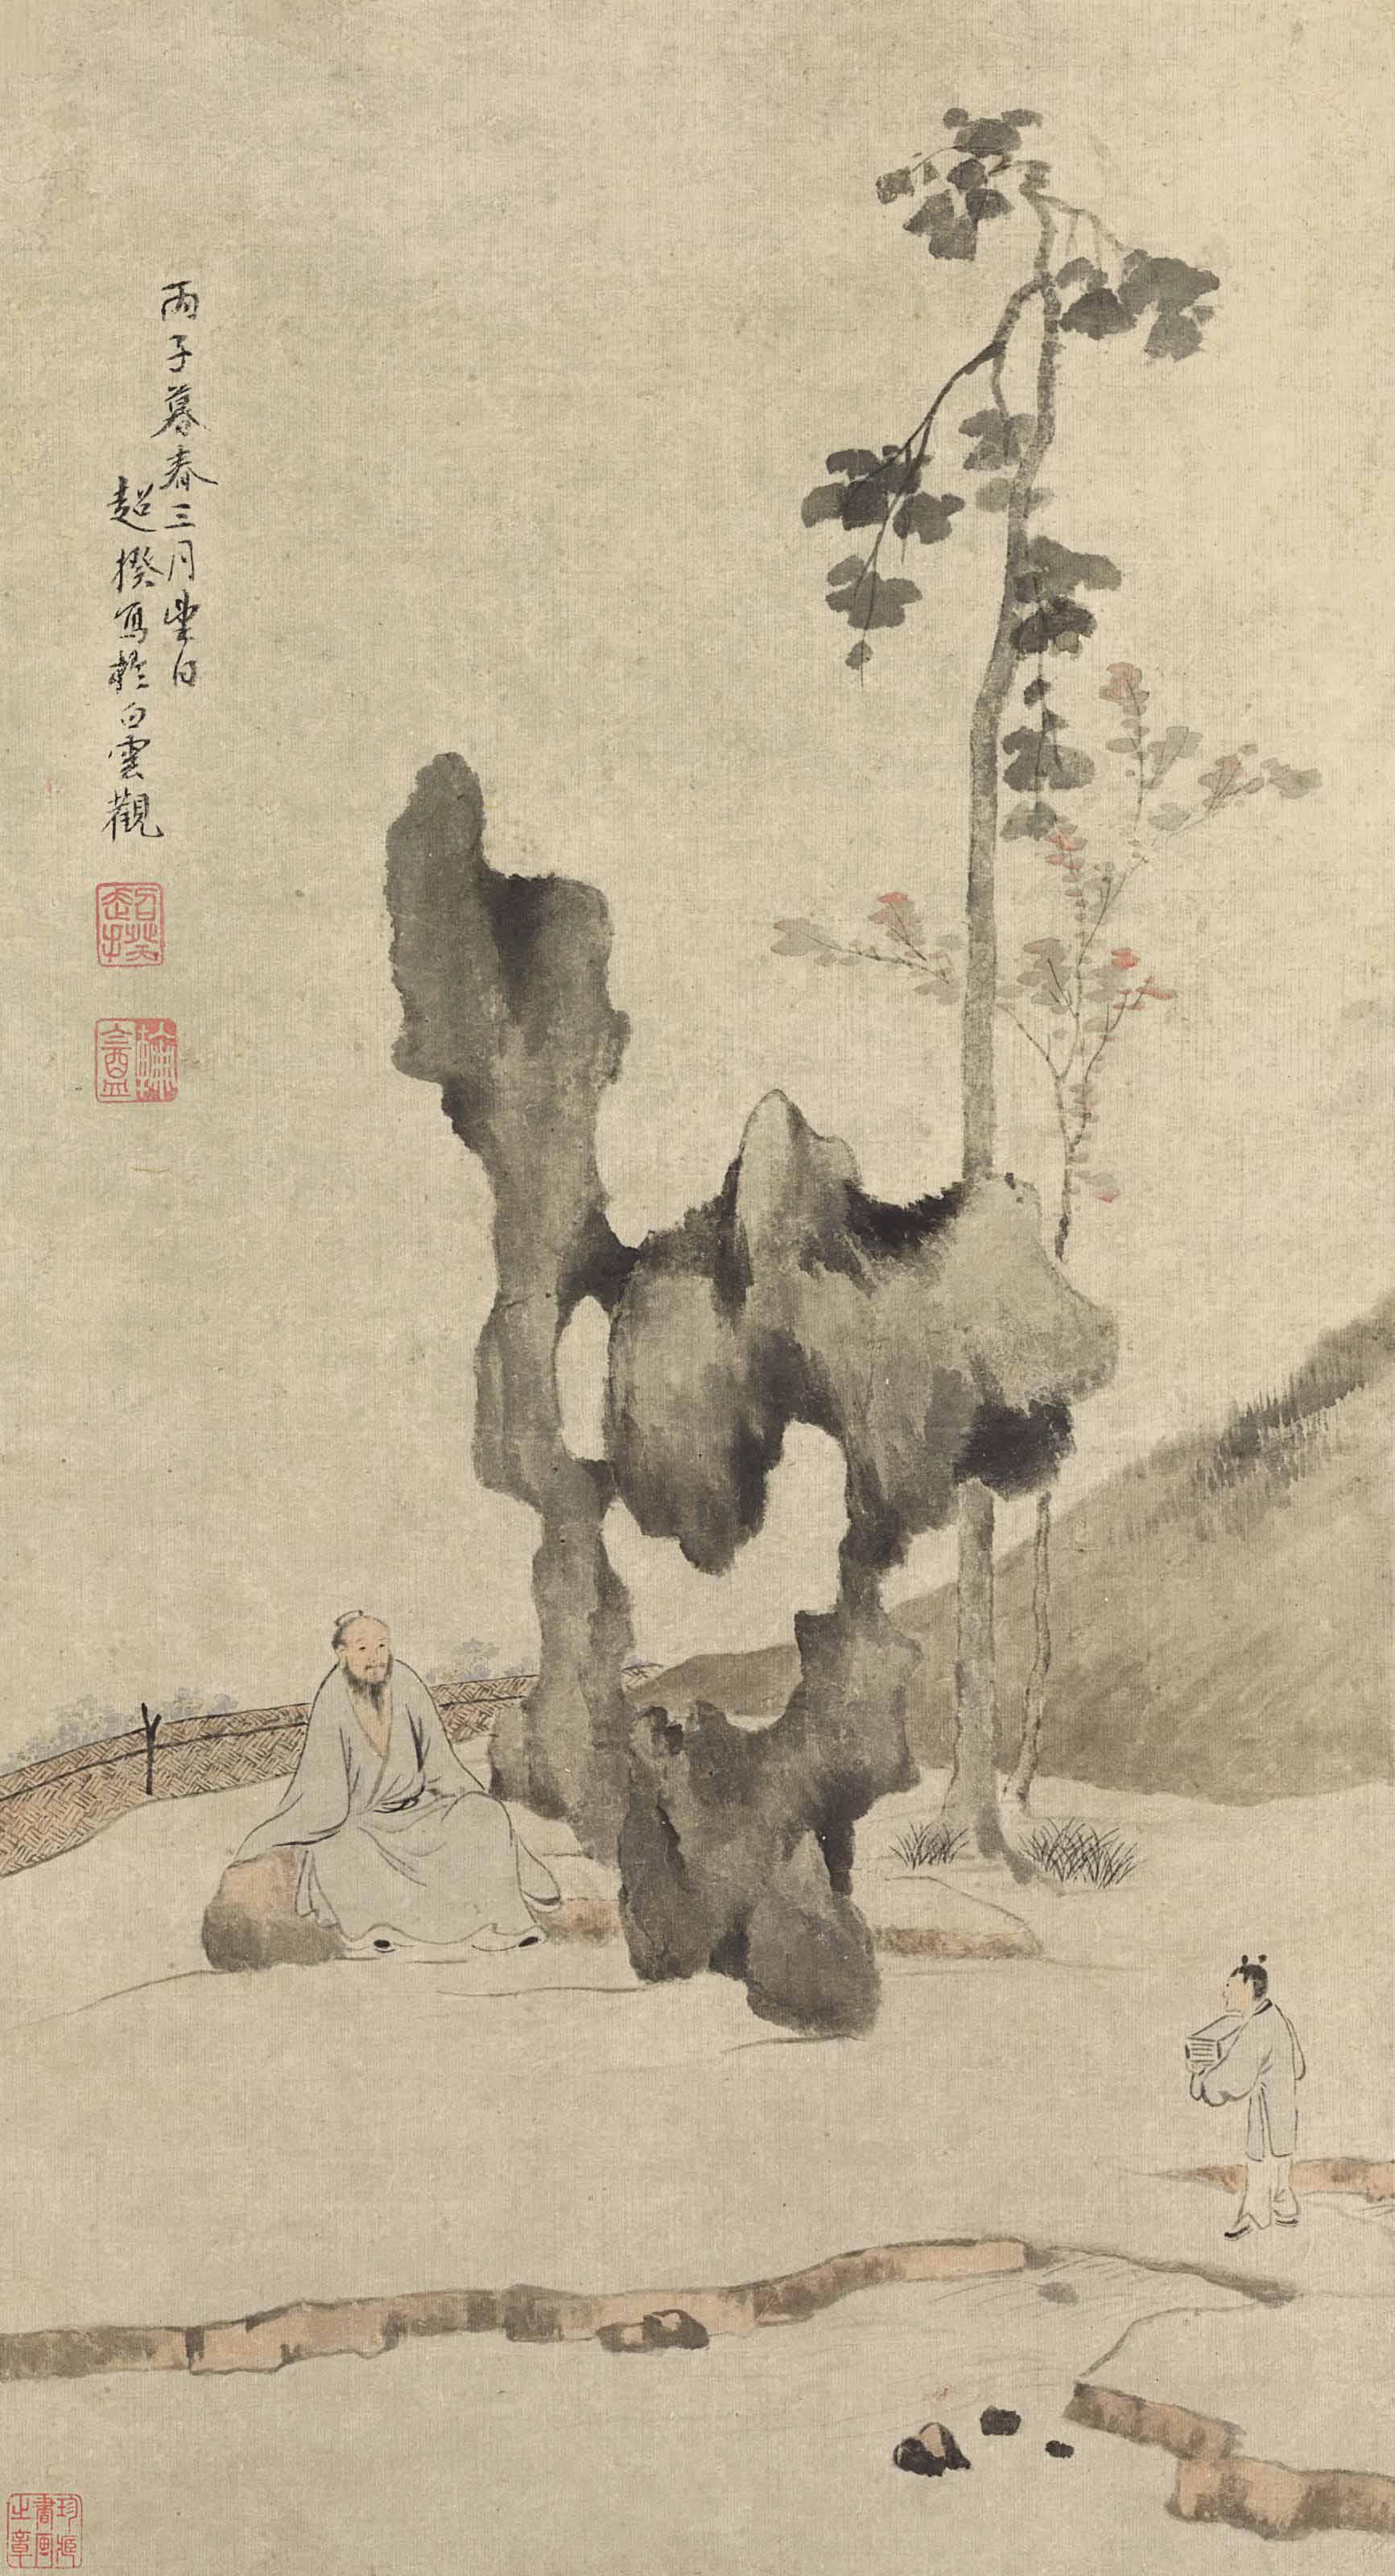 CHAO KUI (17TH CENTURY)